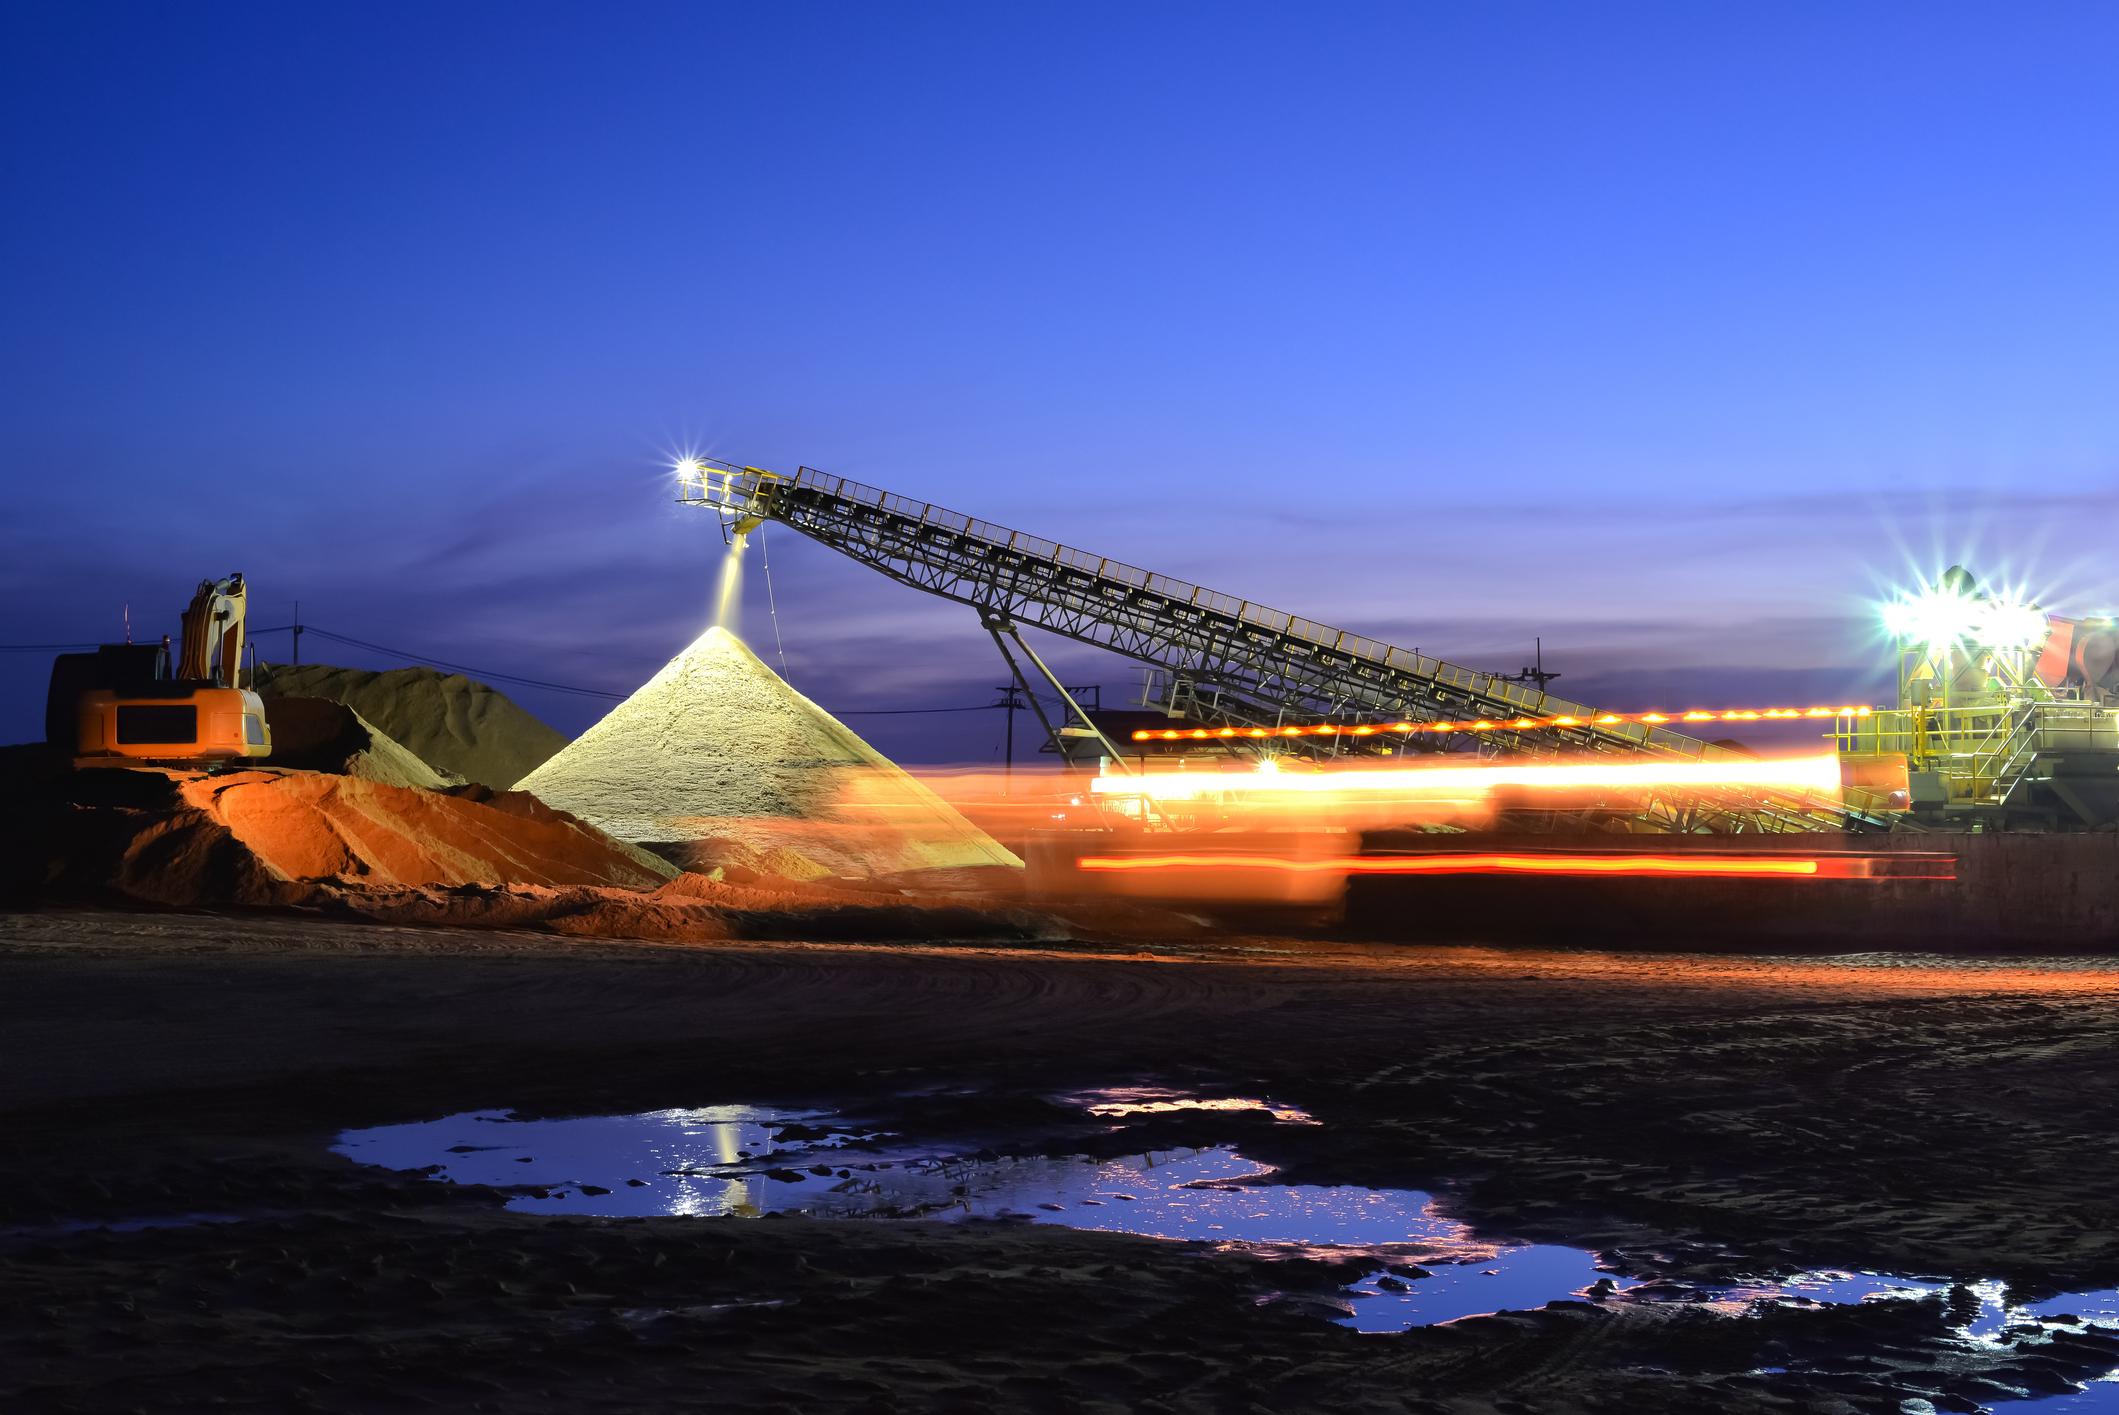 Sand mine at dusk